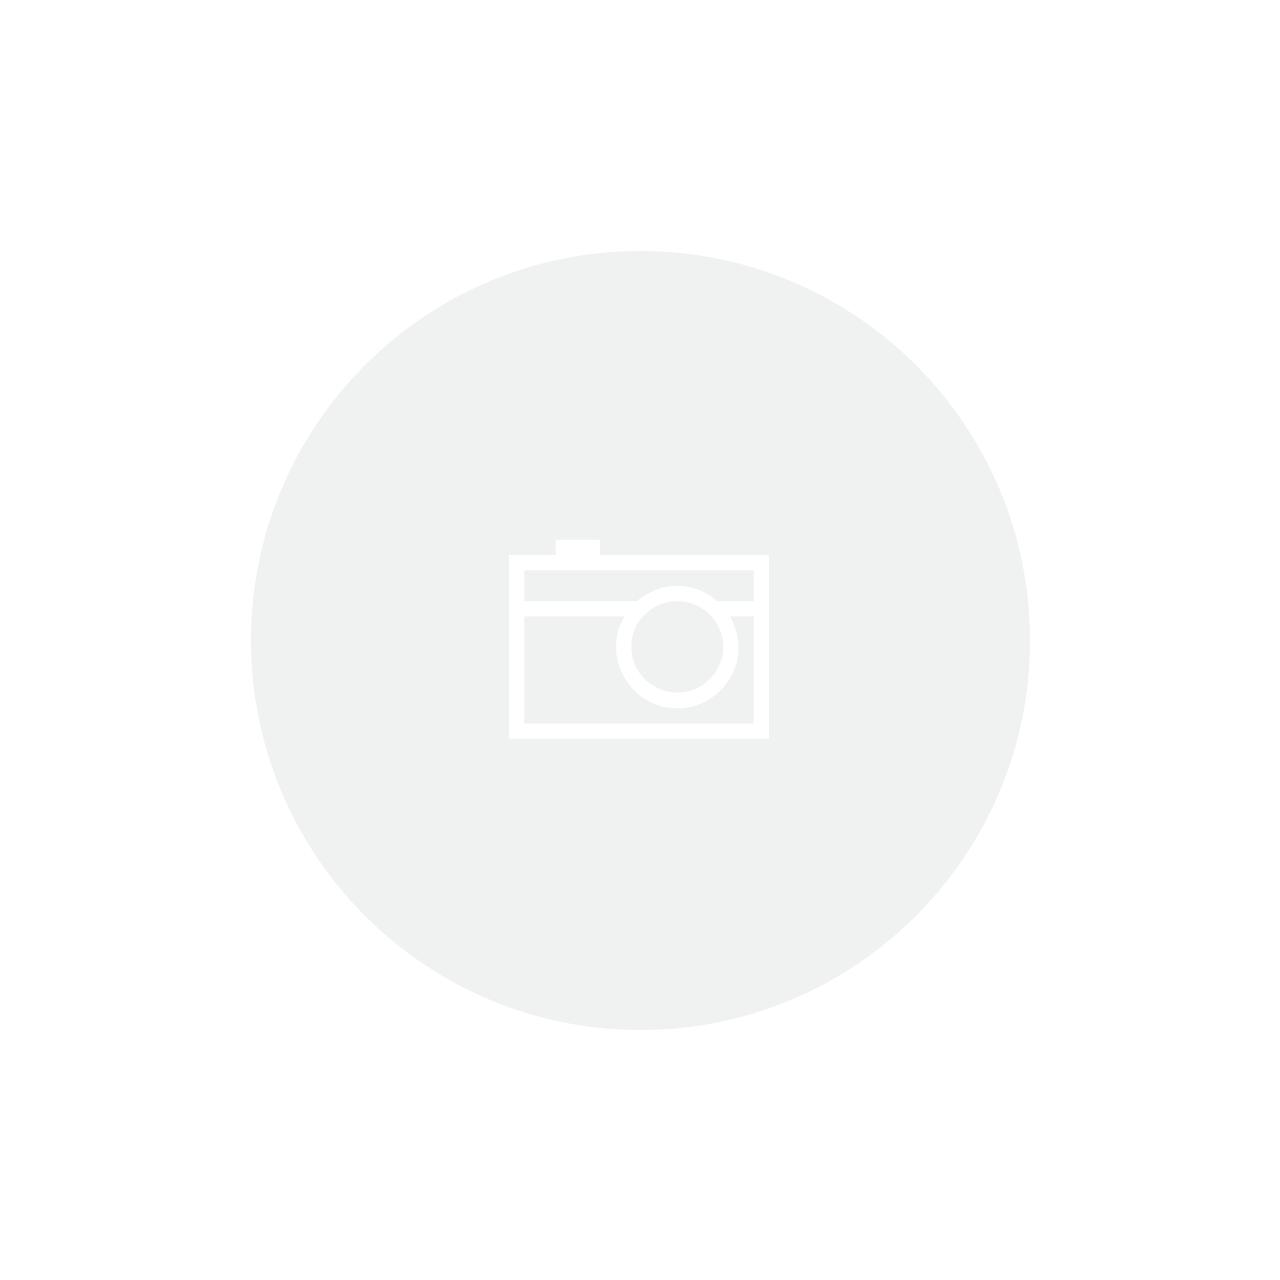 Lixeira para Granito ø316mm 8 Litros Tramontina